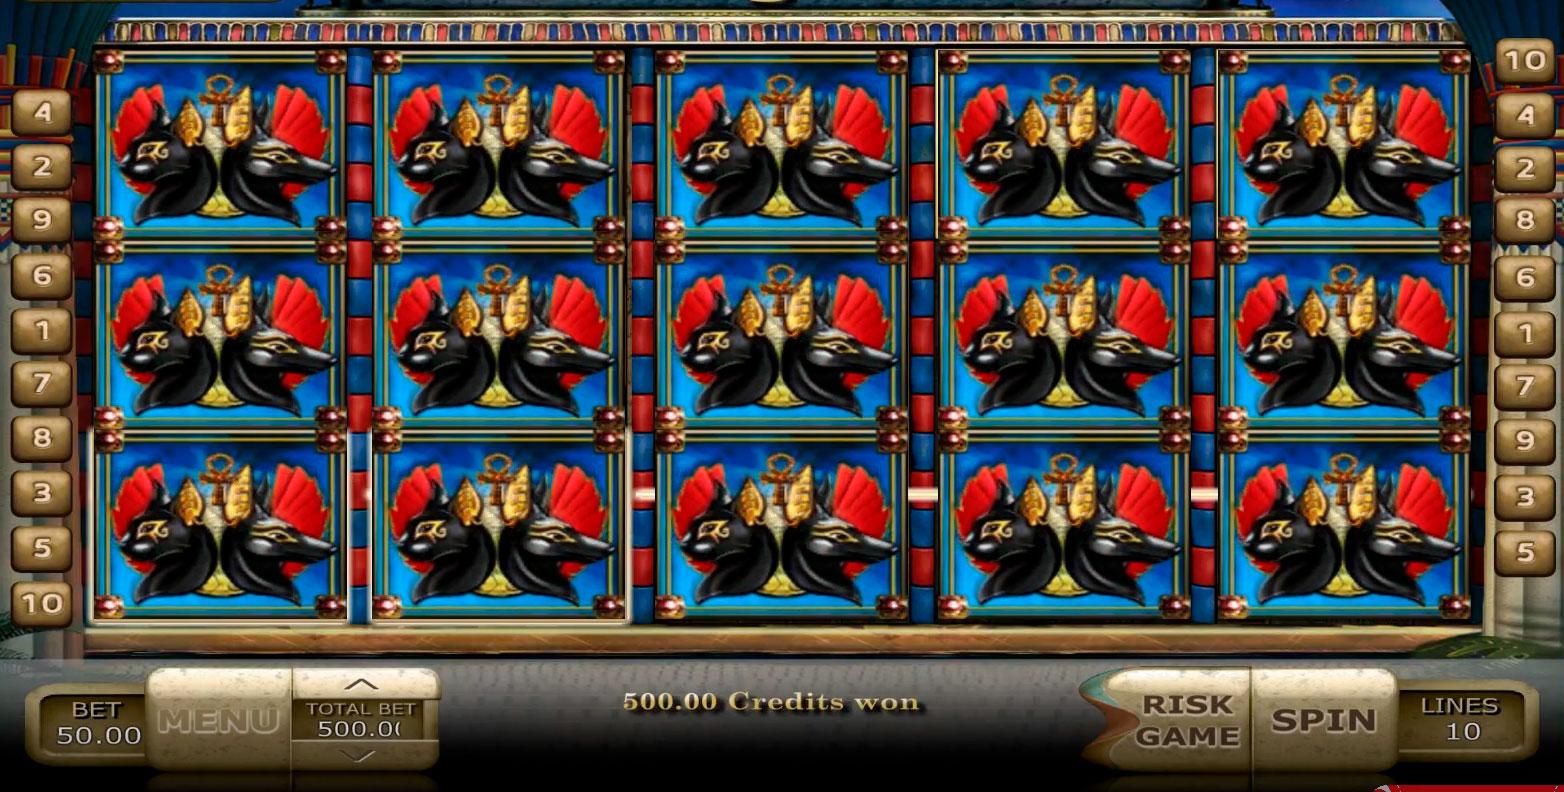 Las vegas usa online casino no deposit bonus